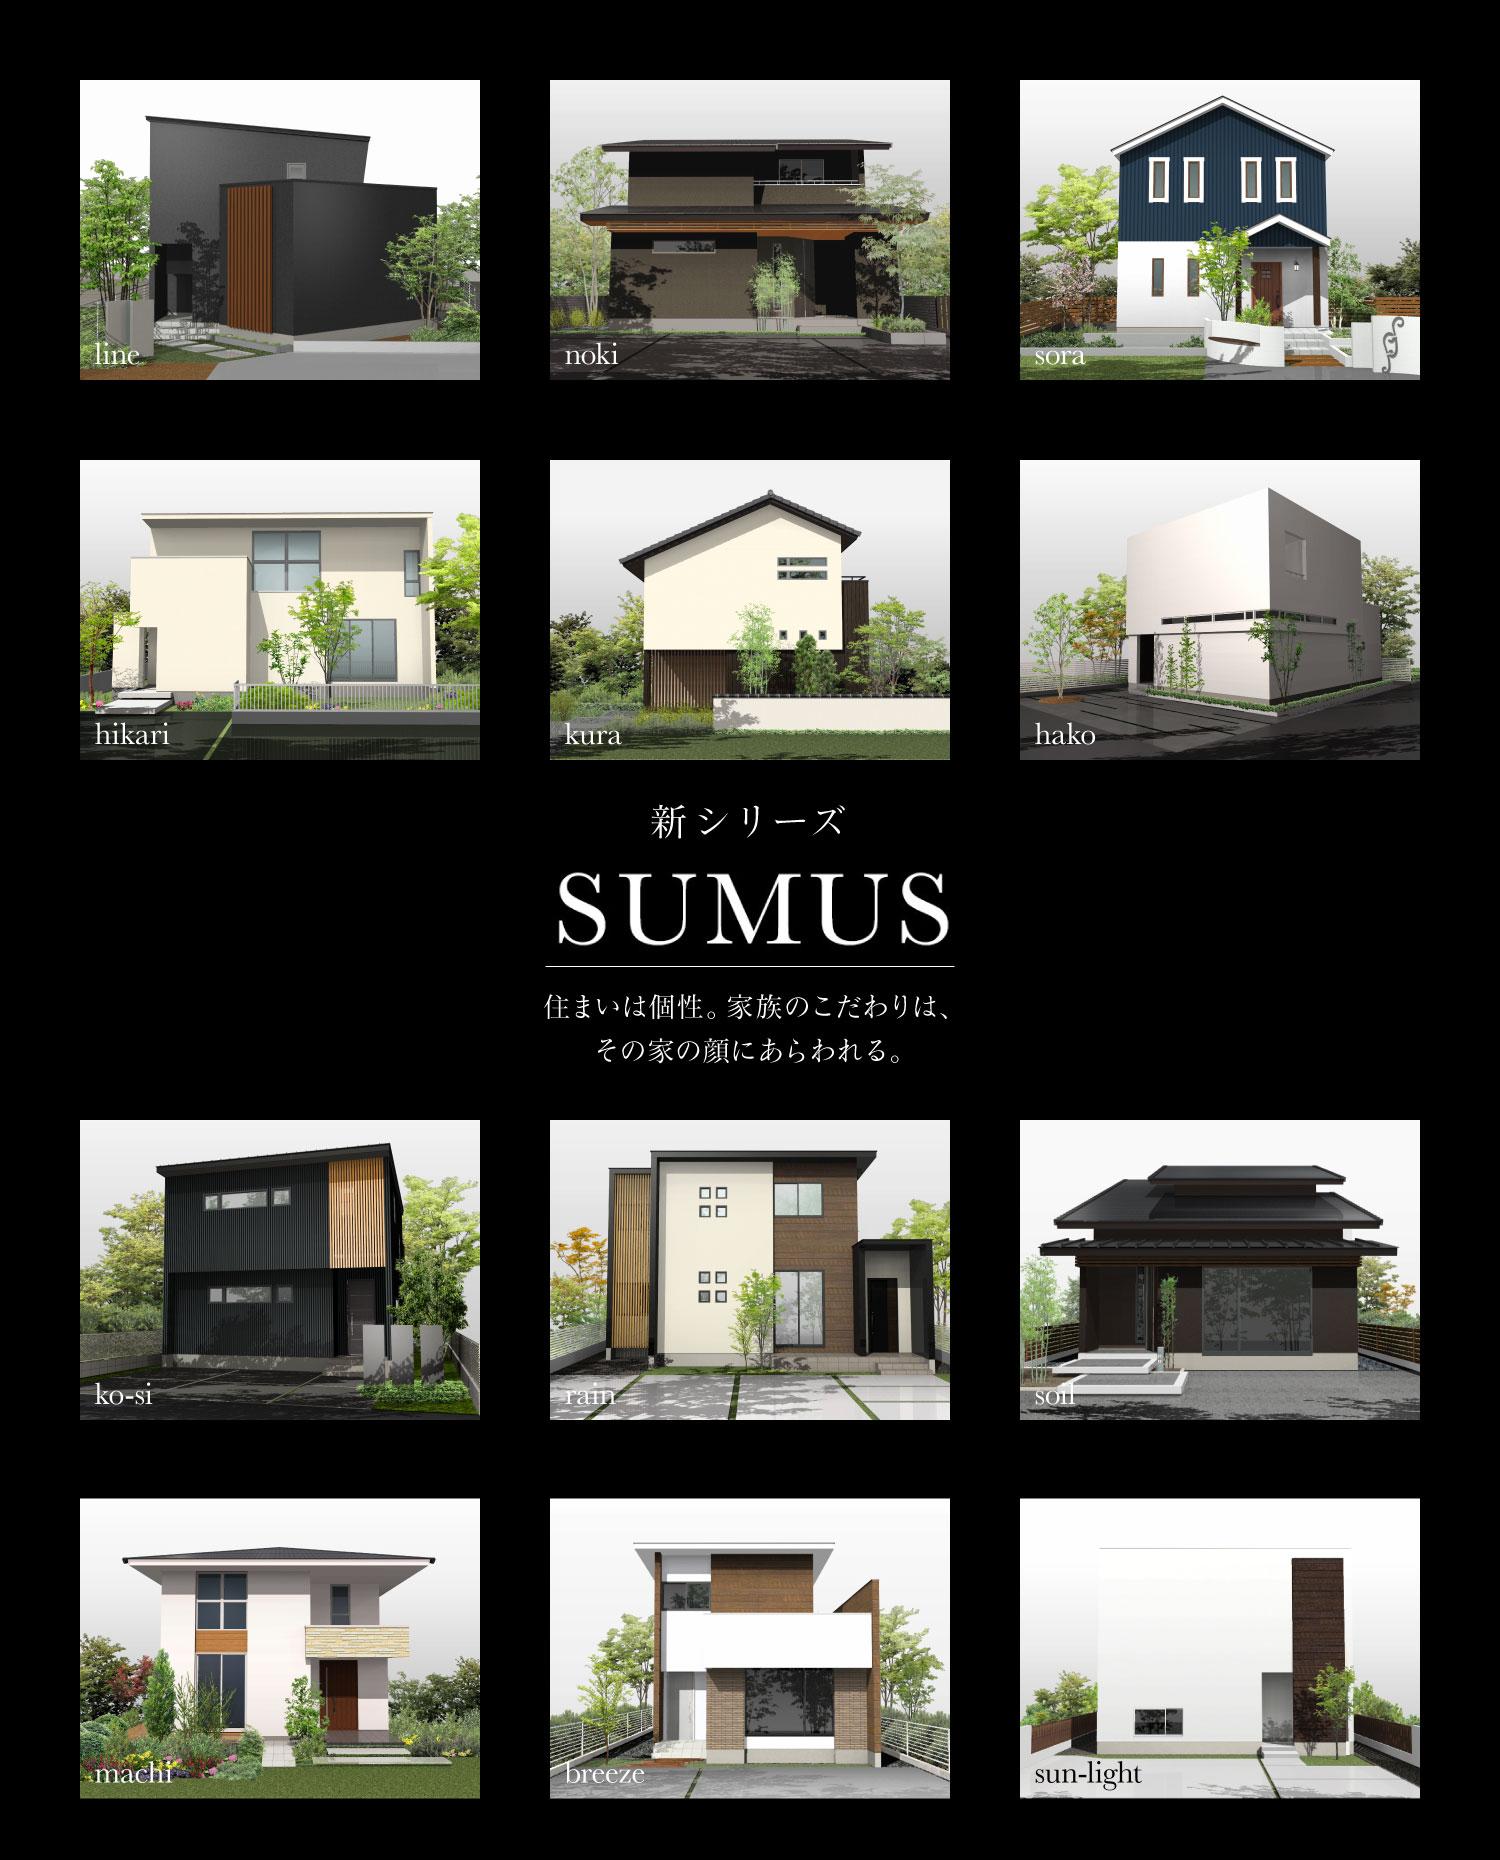 SUMUS 住まいは個性。家族のこだわりは、その家の顔にあわられる。